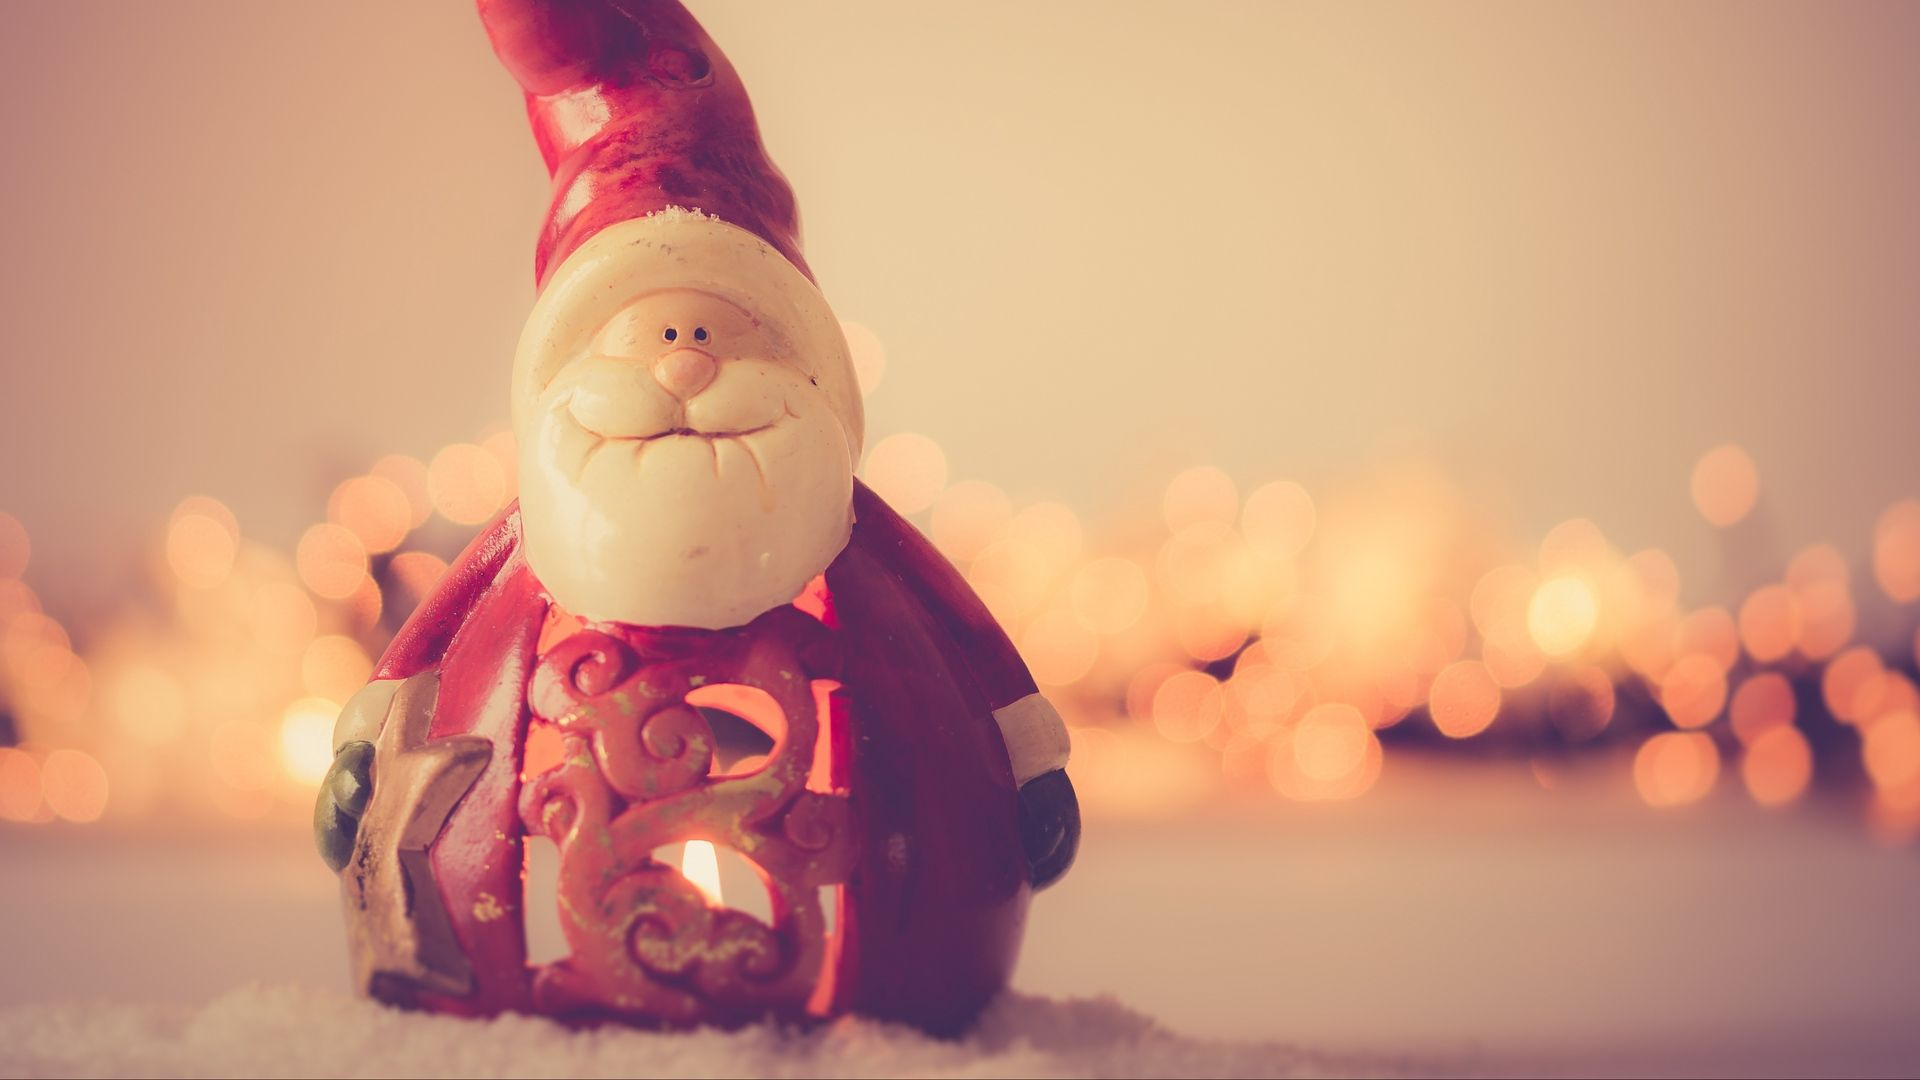 Santa Claus Free Download Wallpaper